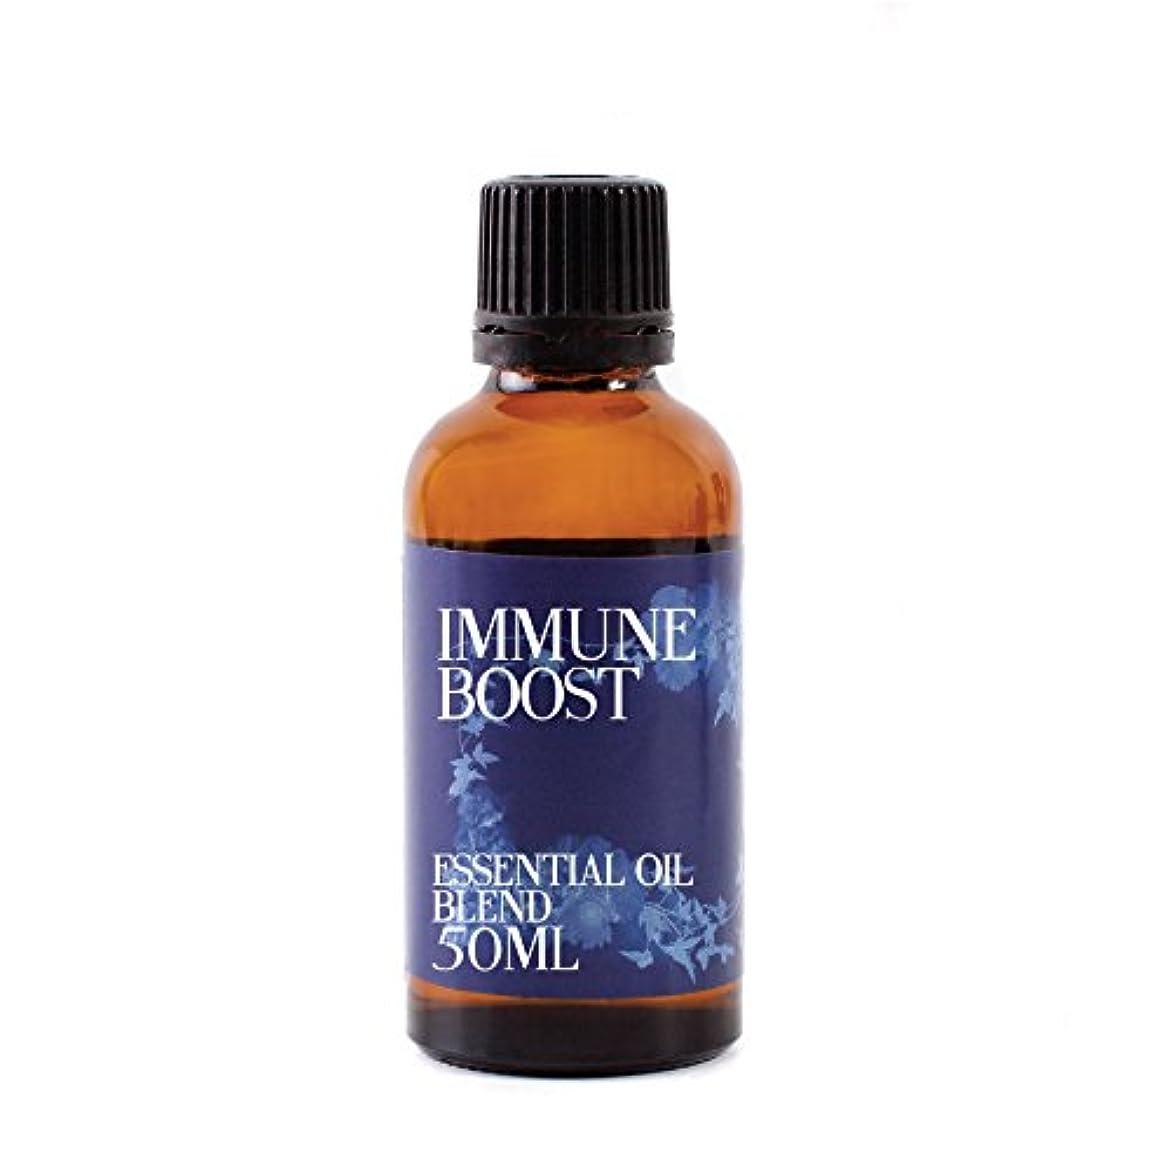 Mystic Moments | Immune Boost Essential Oil Blend - 50ml - 100% Pure